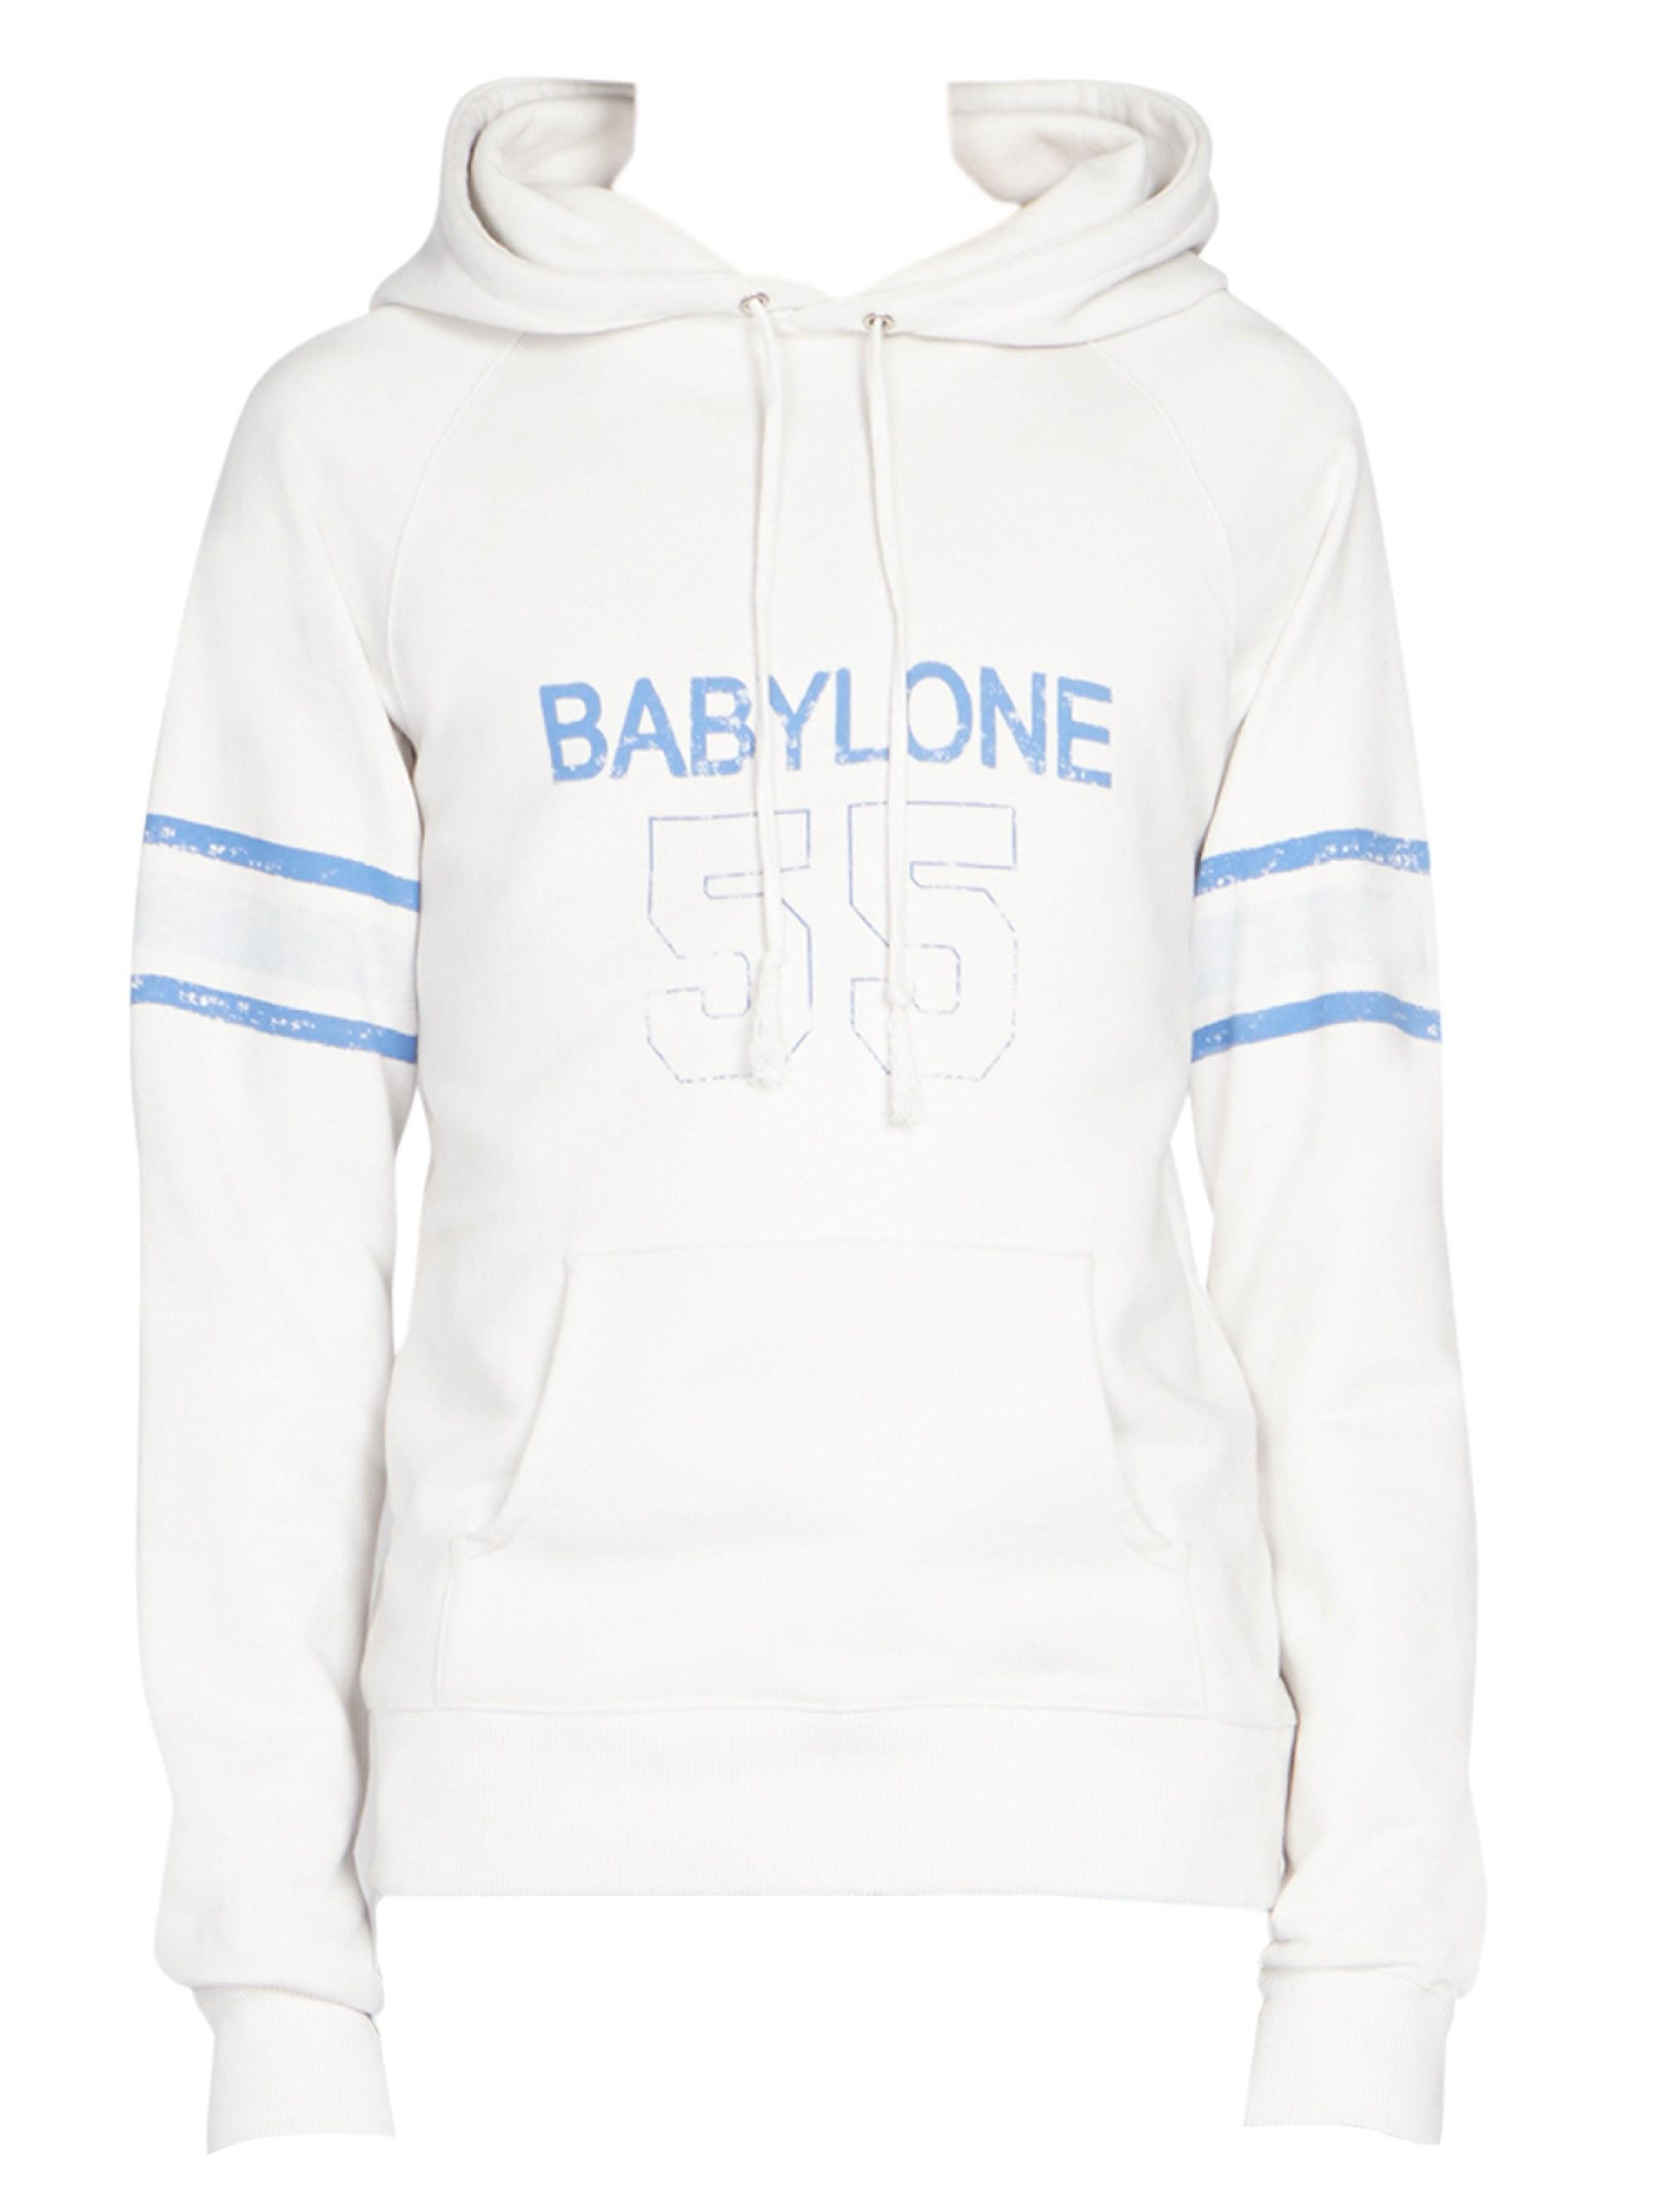 49ac3c88f49 Lyst - Saint Laurent Babylone 55 Hoodie in White for Men - Save 31%